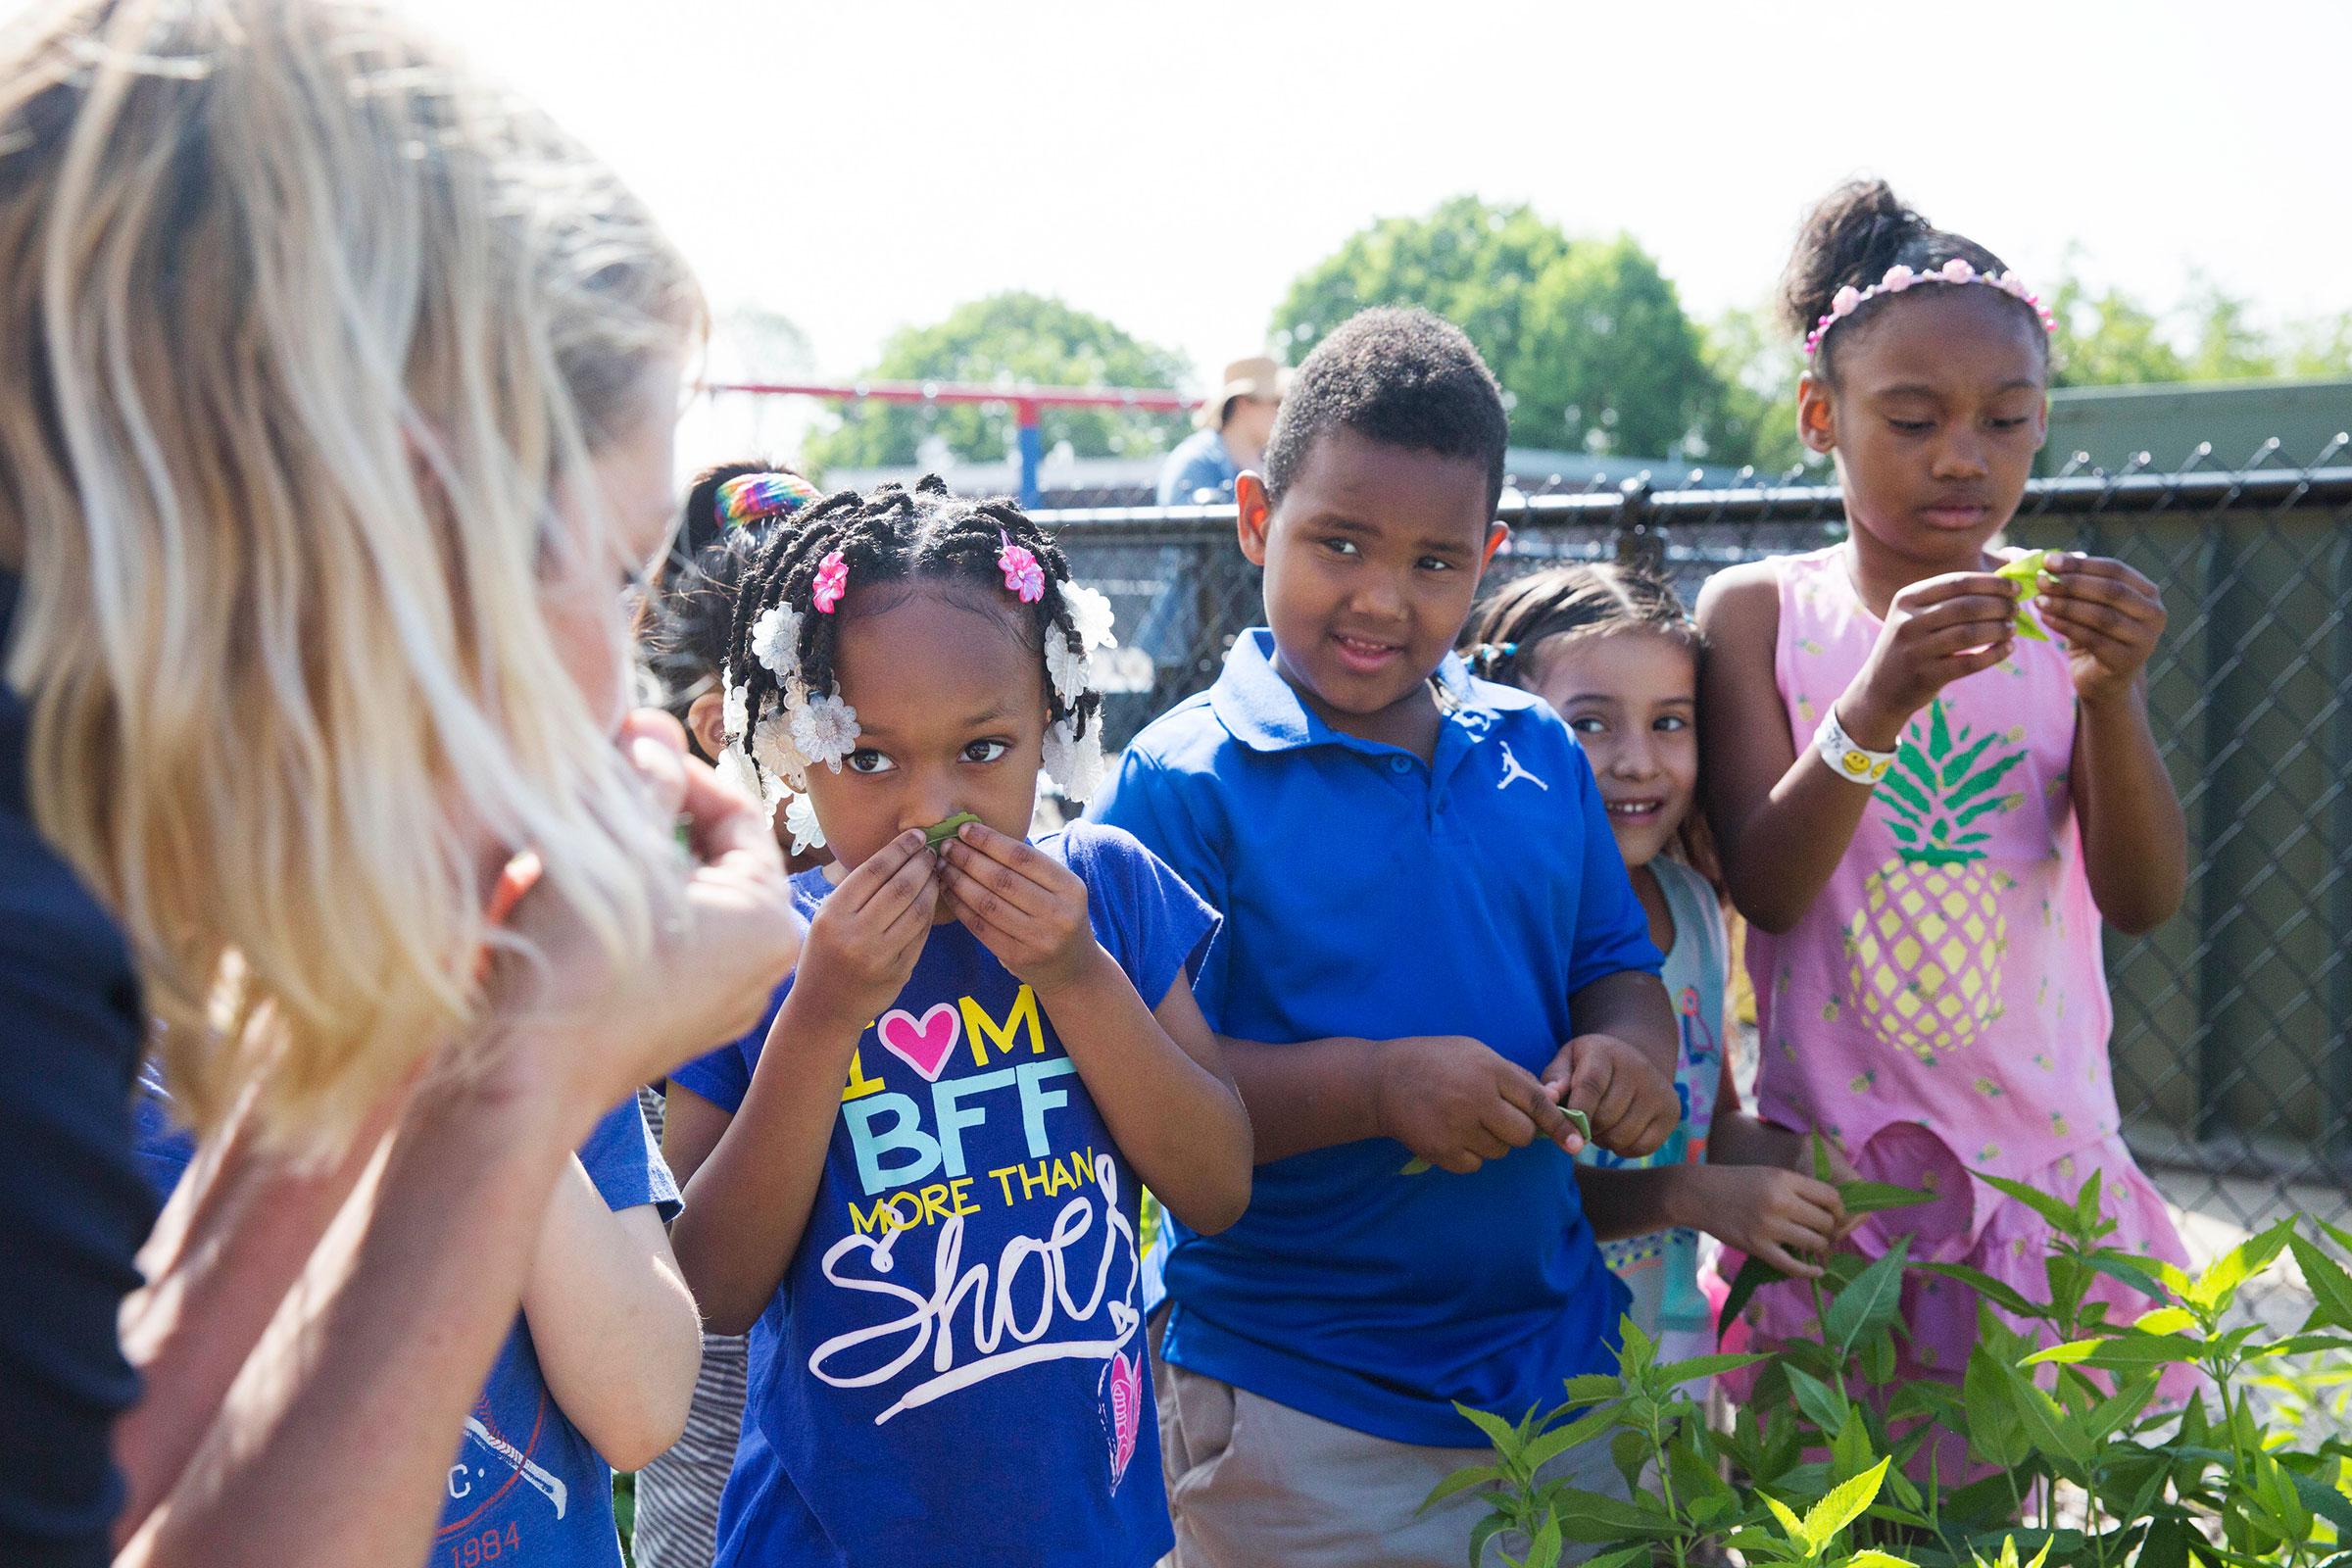 Barron and the students at the Mussleman Kindergarten Center smell native mountain mint. Rachel Wisniewski